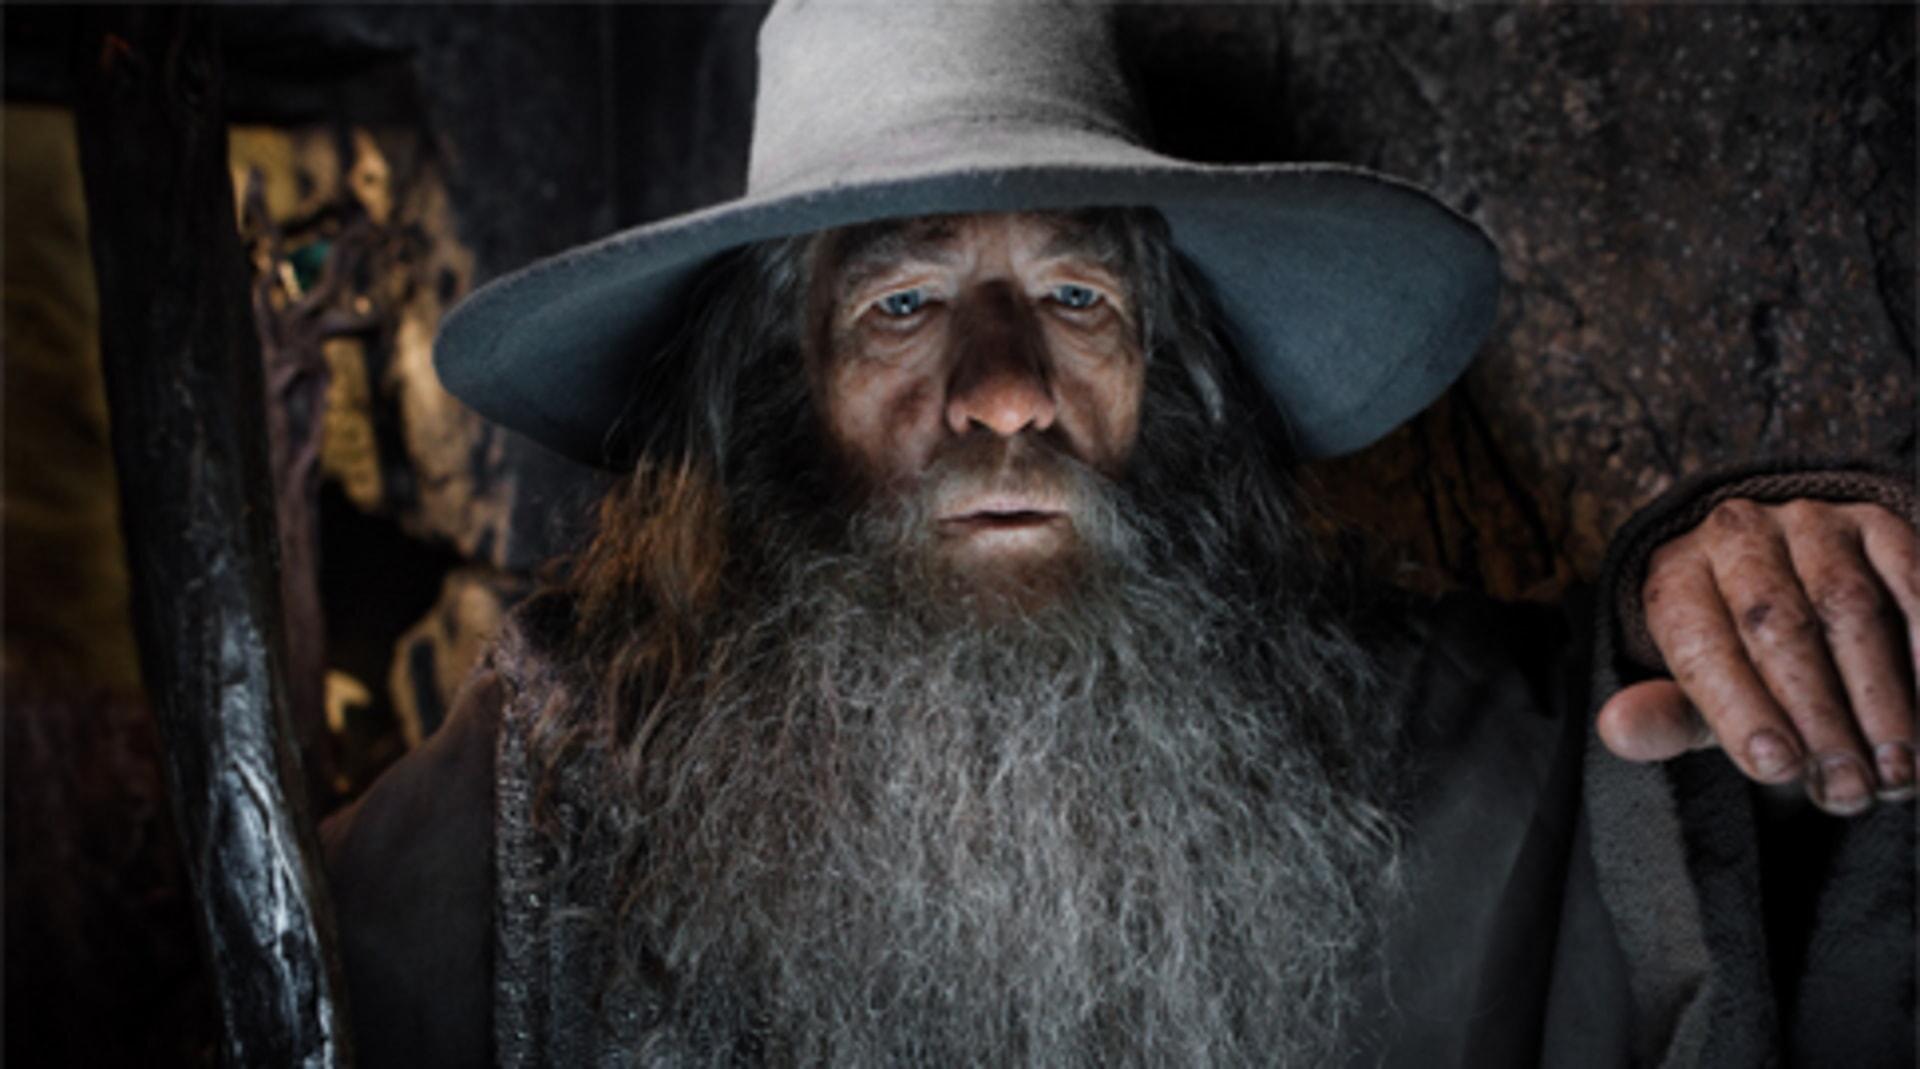 The Hobbit: The Desolation of Smaug - Image 29